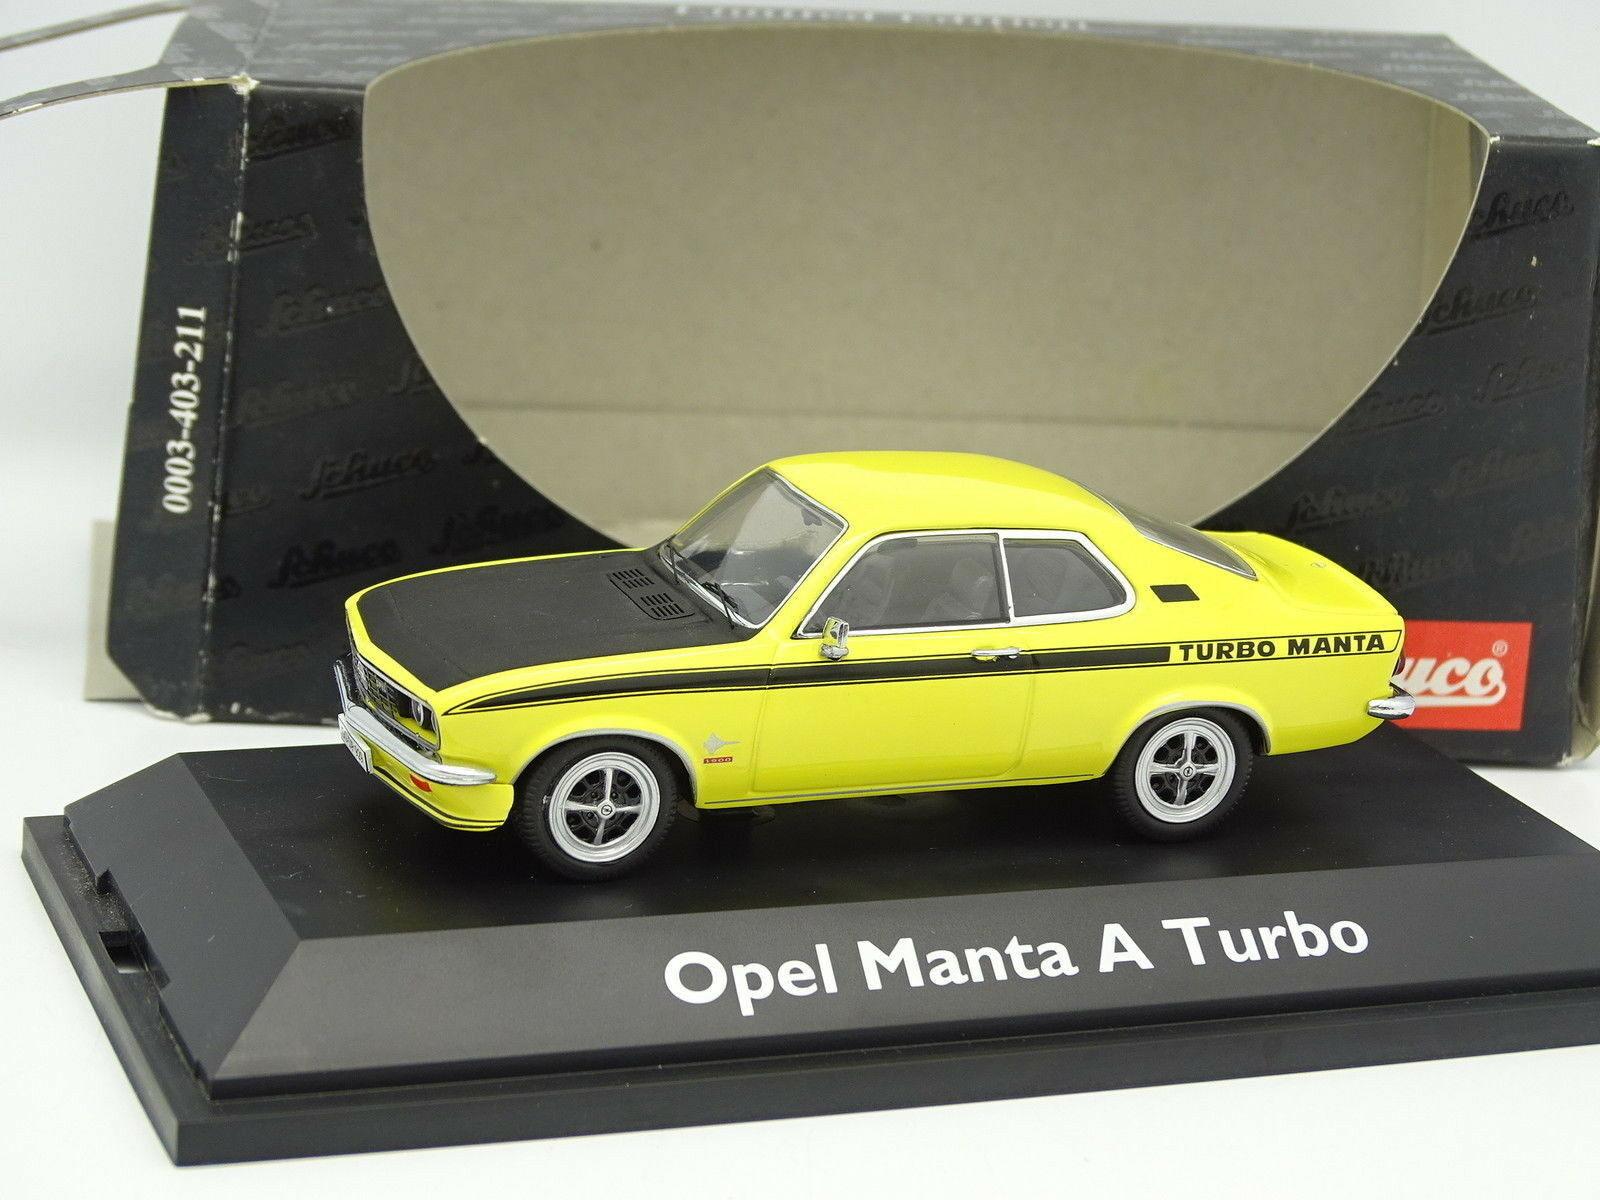 Schuco 1 43 - Opel Opel Opel Manta A Turbo Yellow fe249a